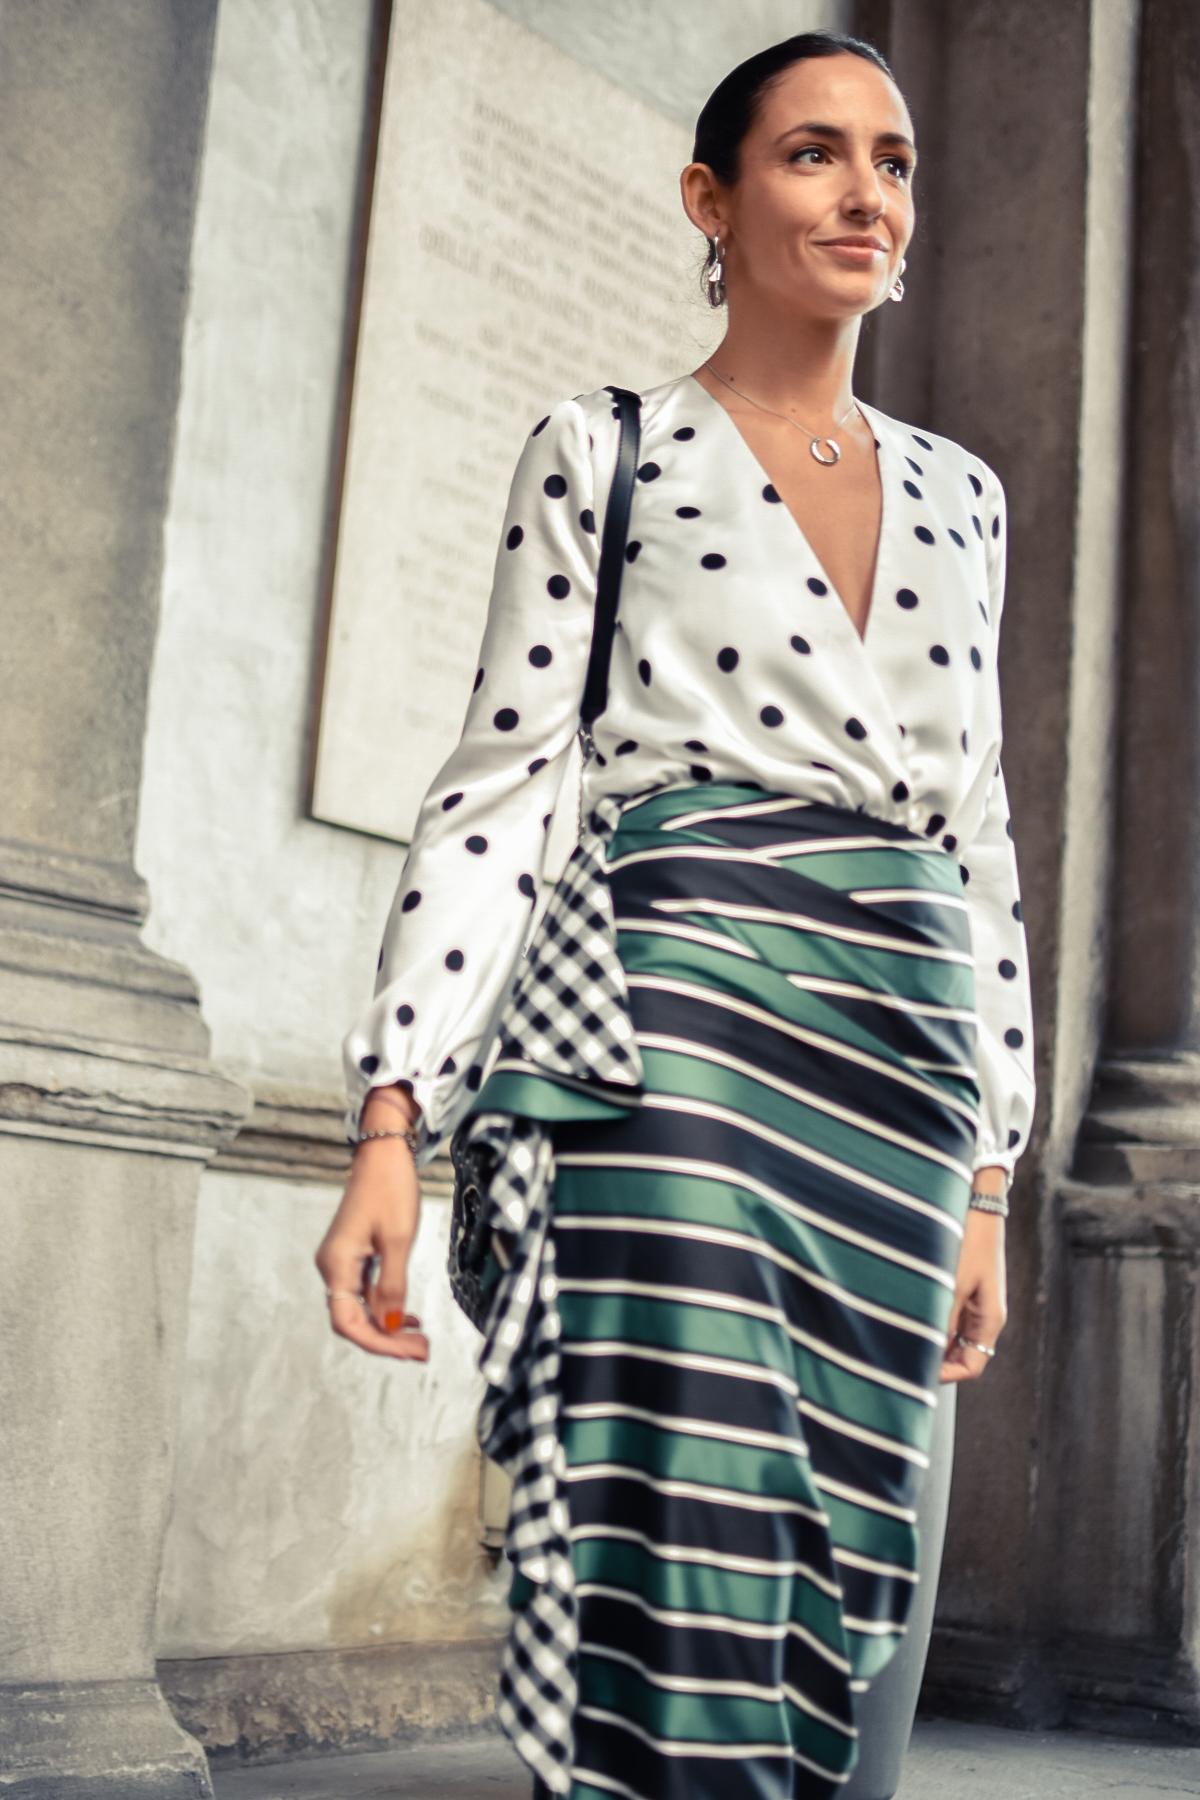 portael-blog-de-silvia-mfw-milan-fashion-week-street-style-falda-rayas-manolo-blahnik